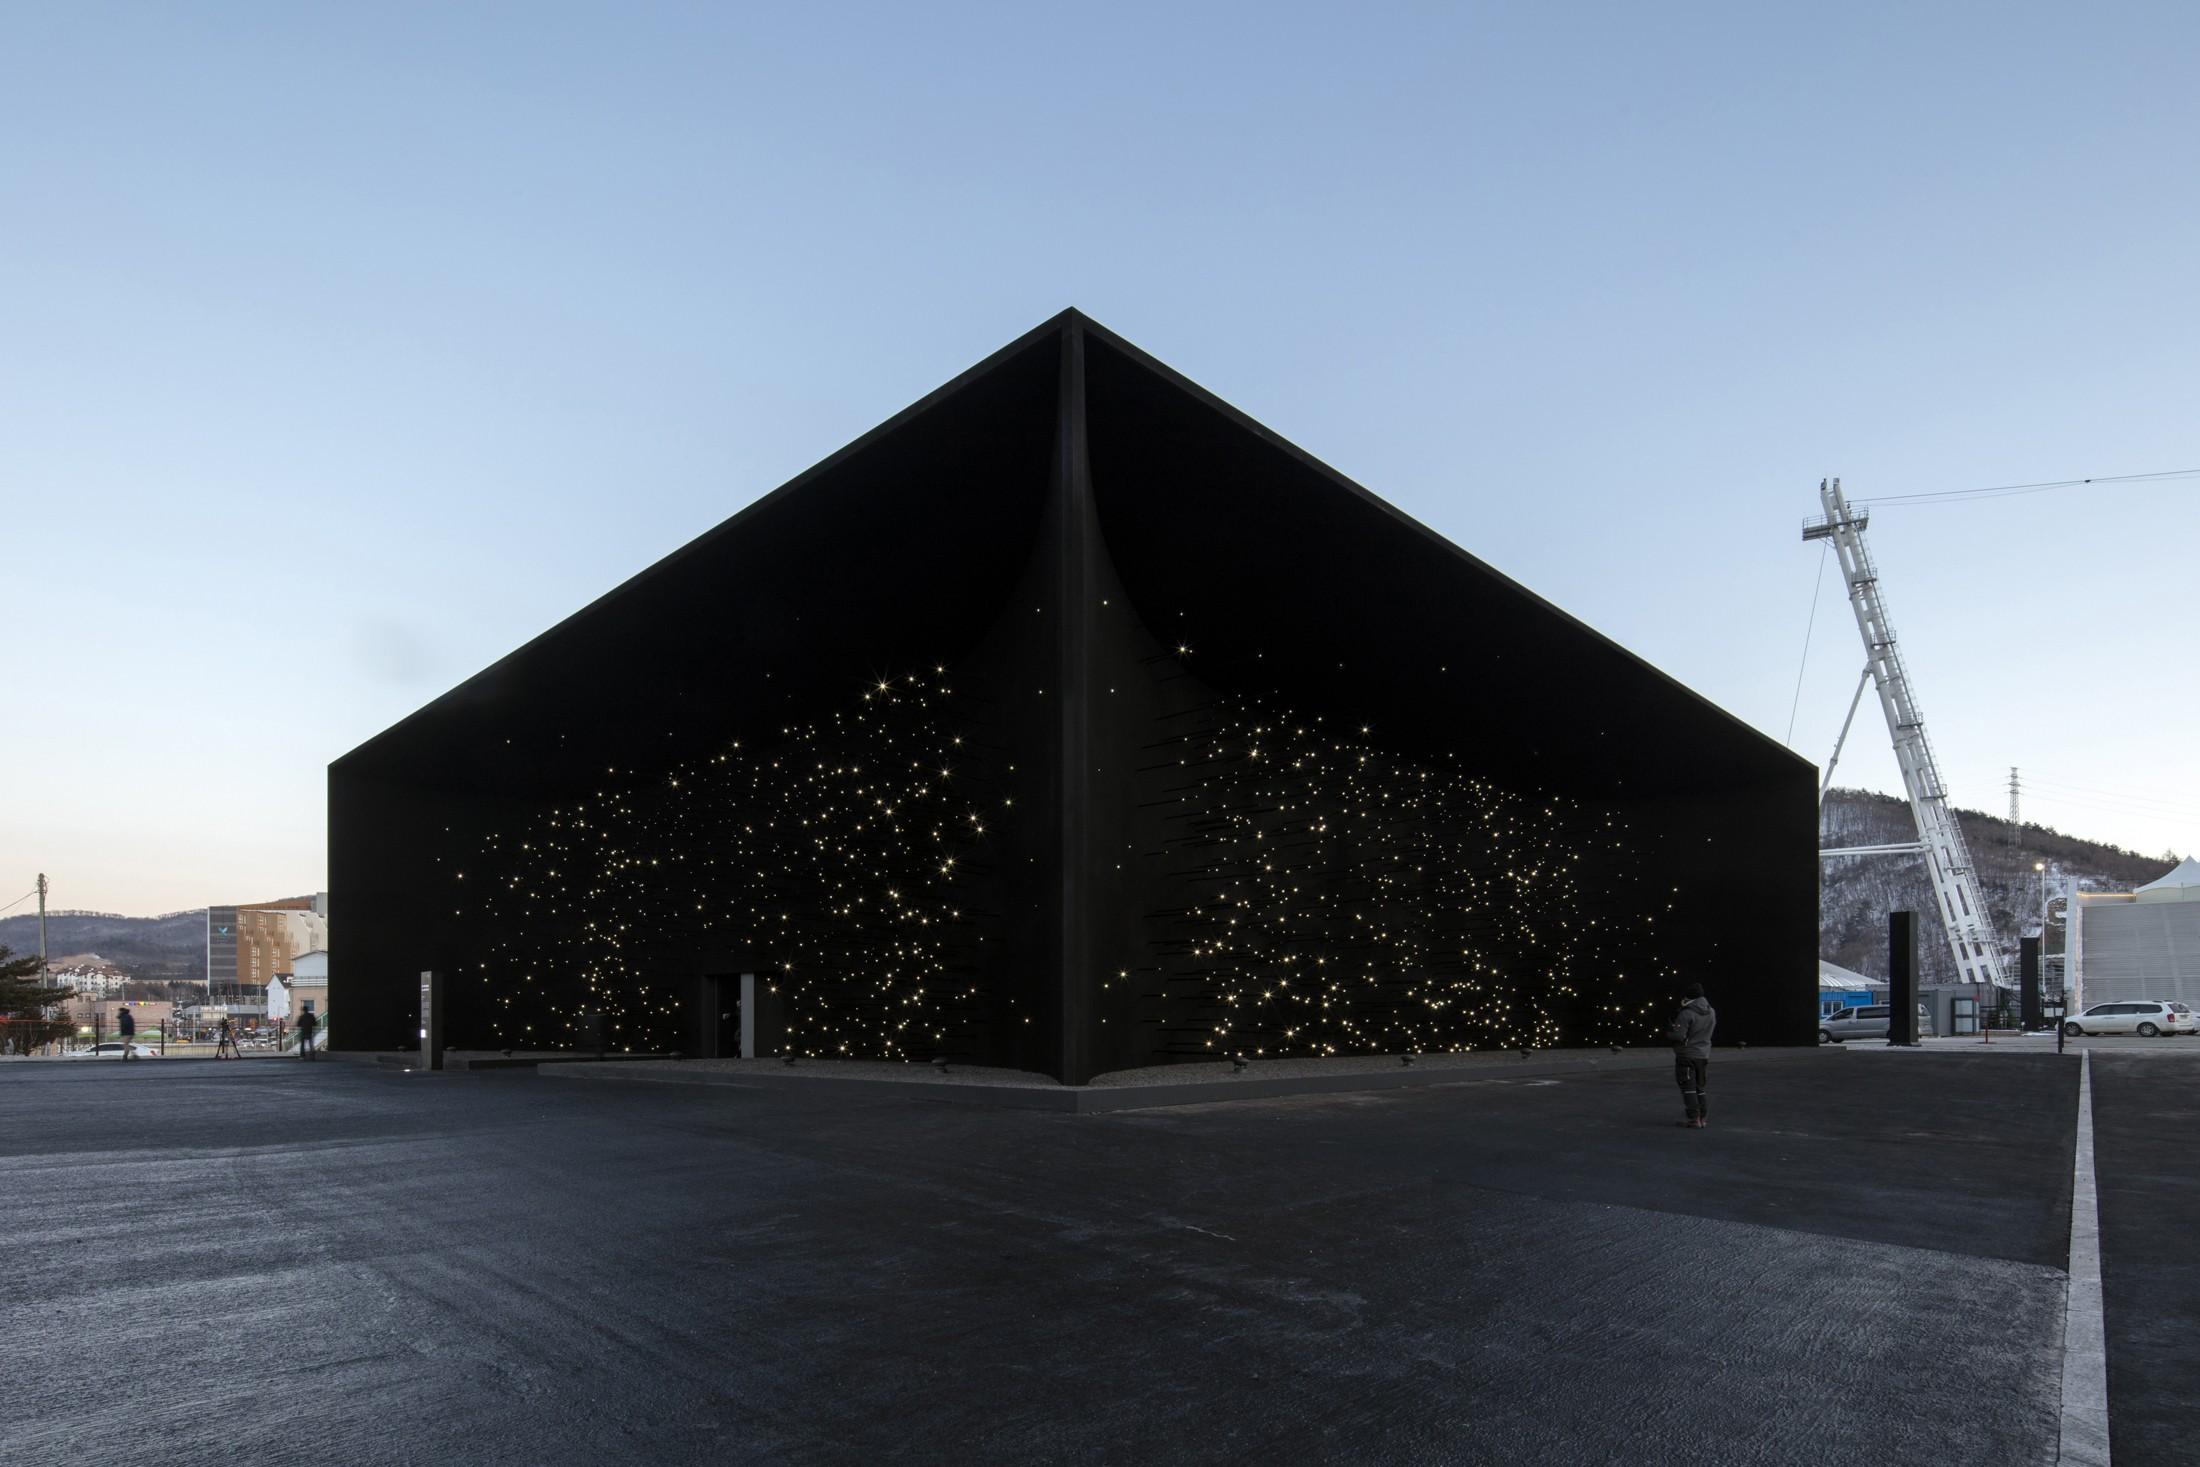 Asif-Khan-PyeongChang-Winter-Olympics_001-2200x1467.jpg